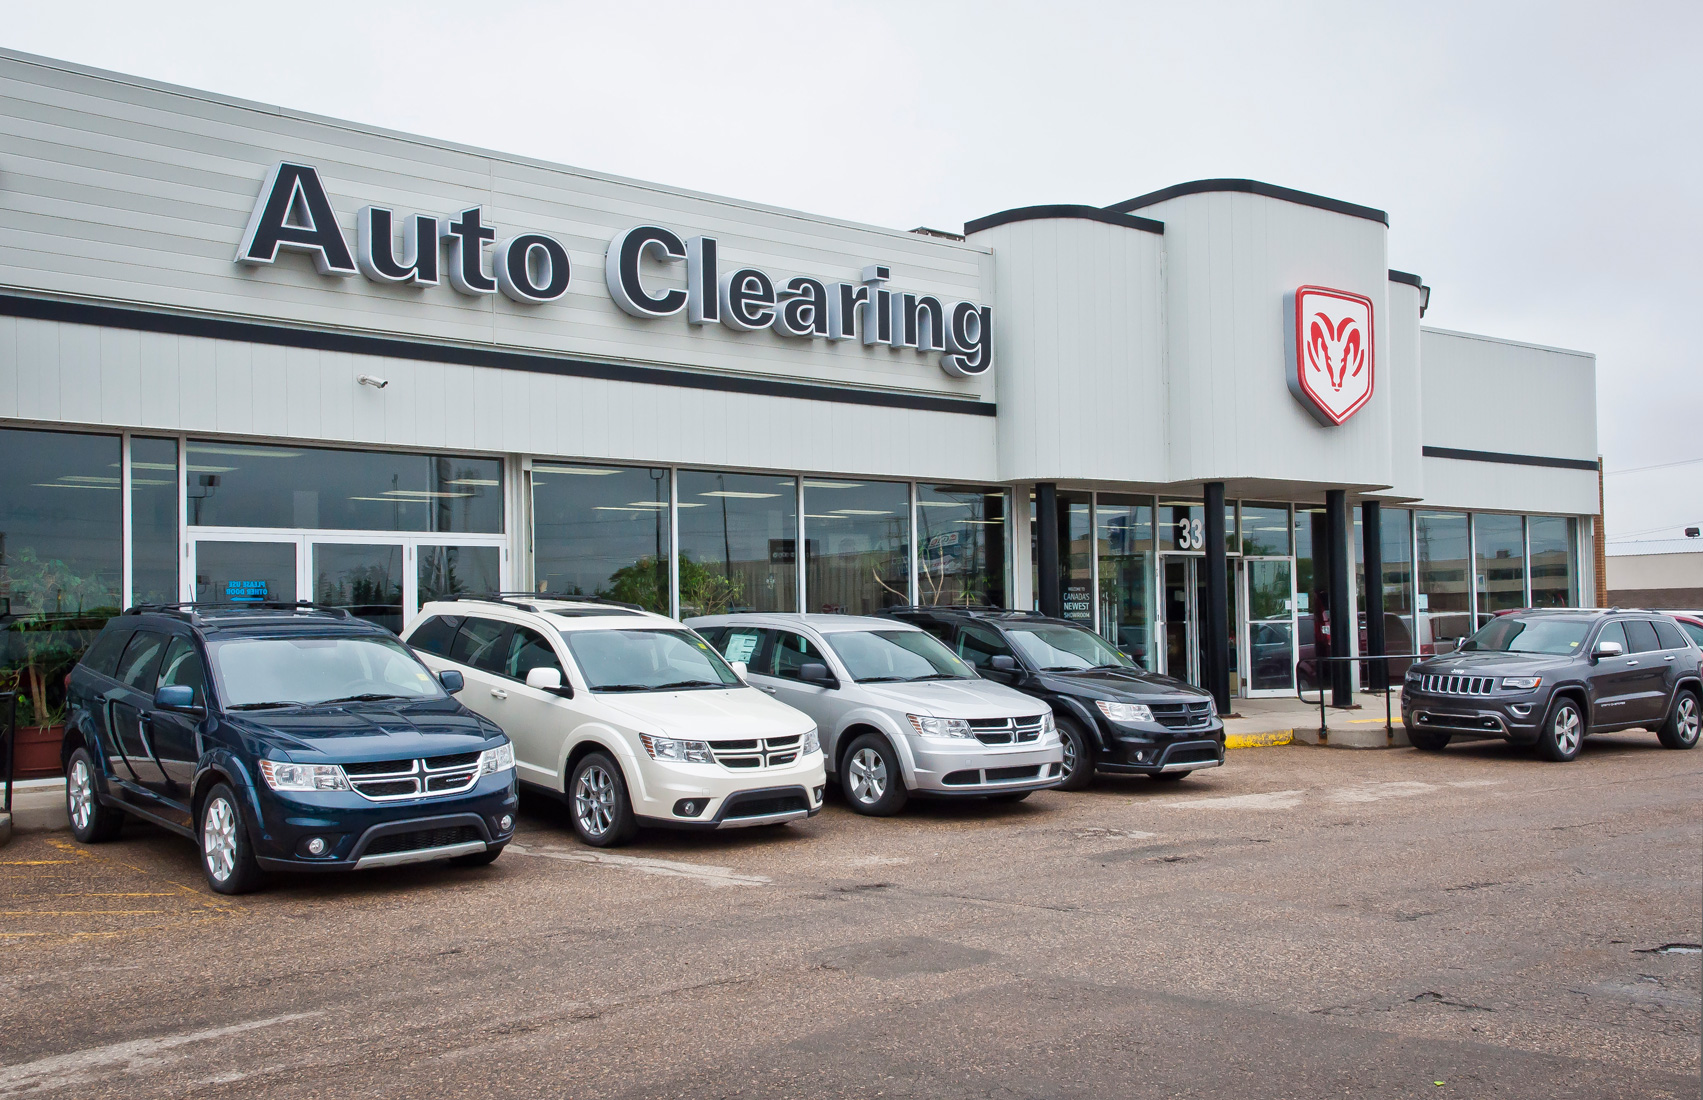 Auto_Clearing-_Chrysler_1.jpg